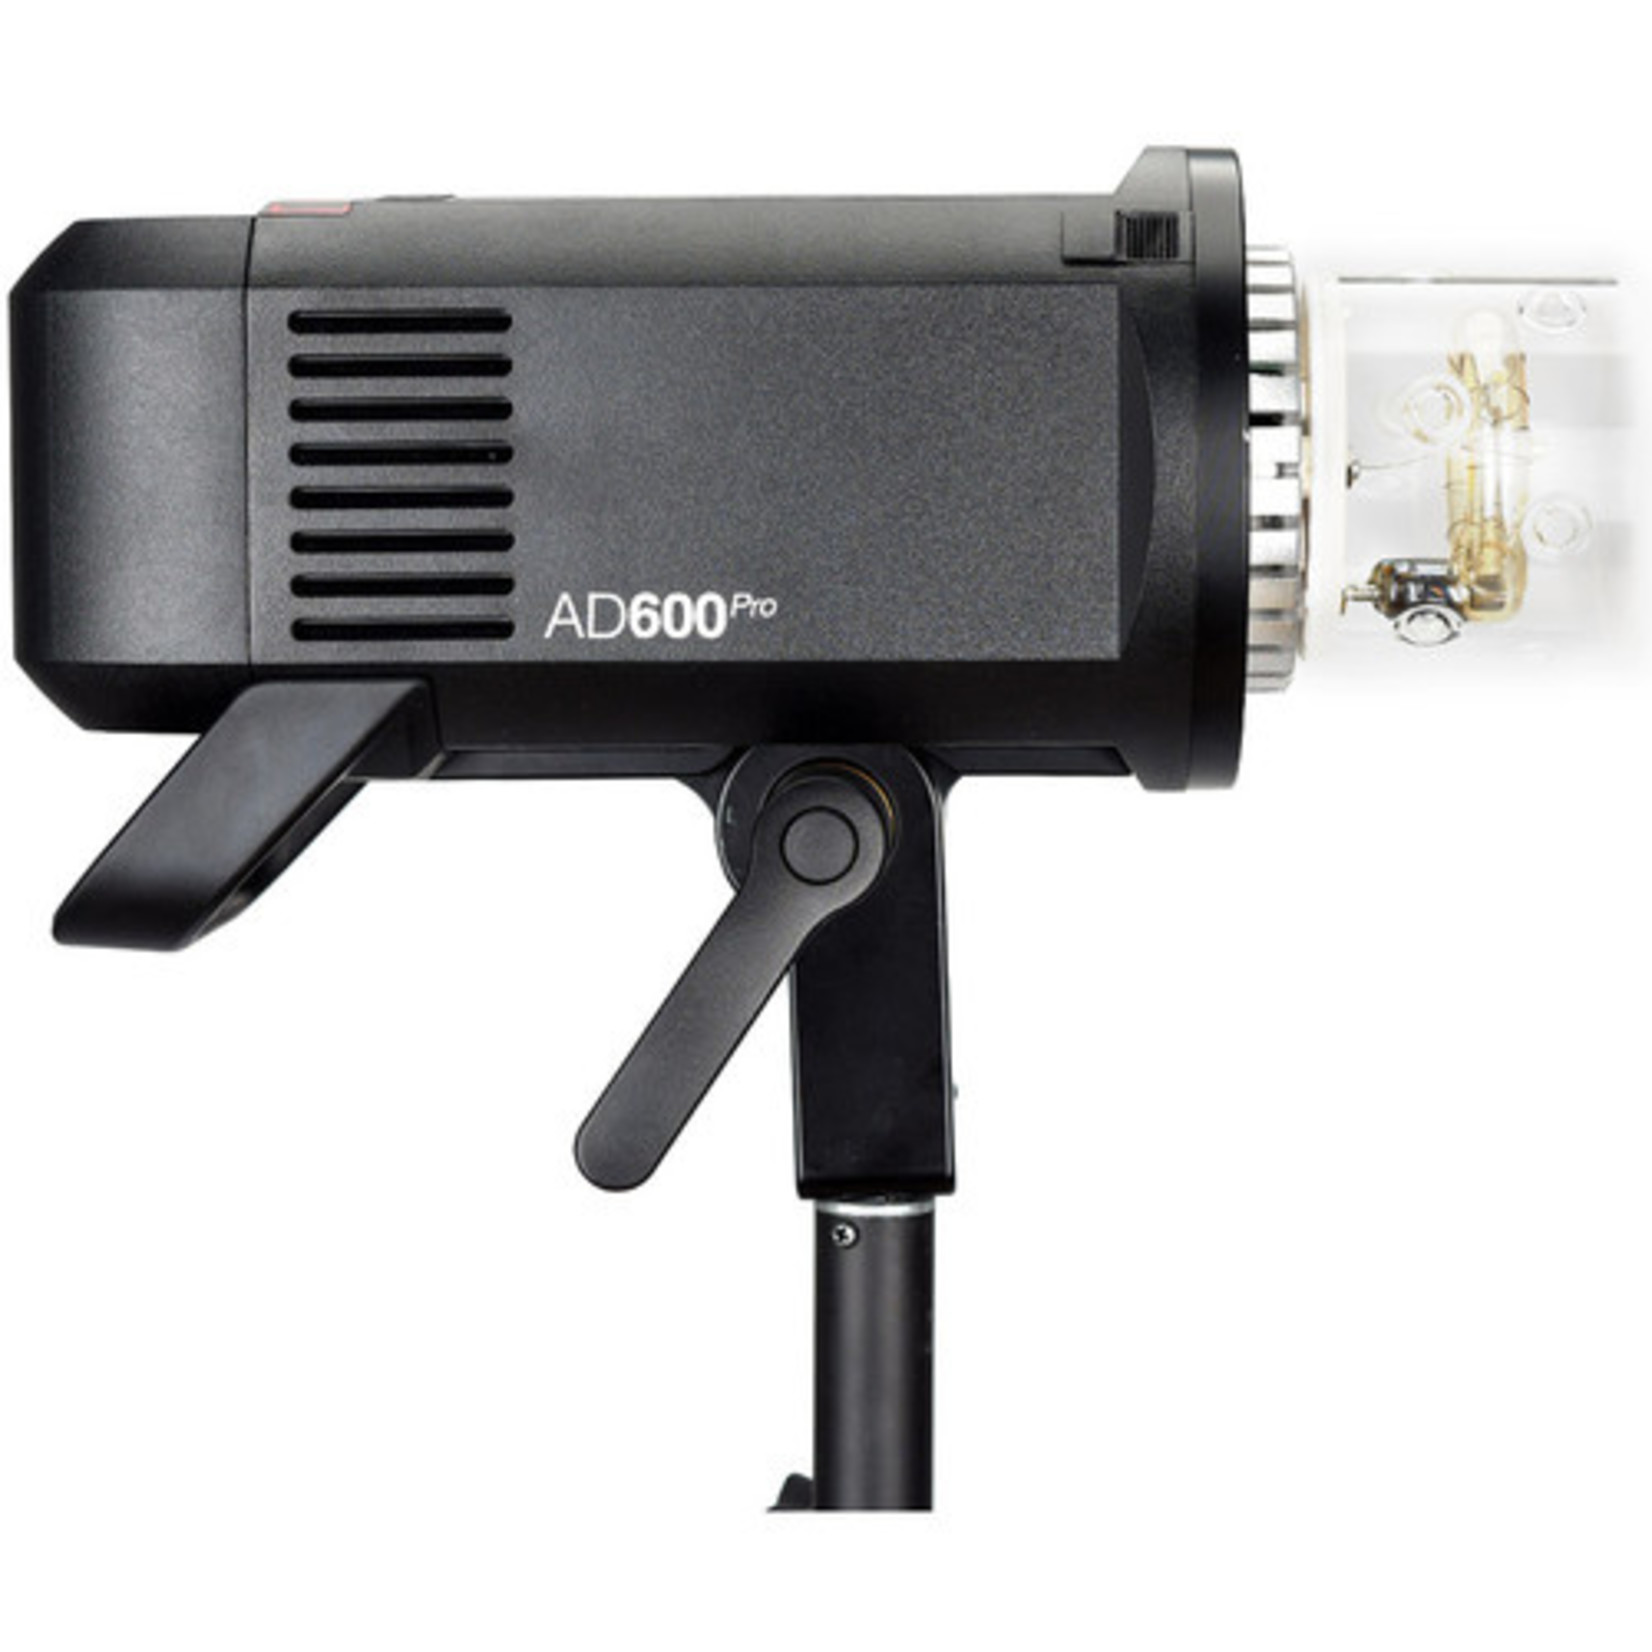 Godox Godox Witstro 600 W/S AD600 Pro TTL All-in-One Outdoor Flash